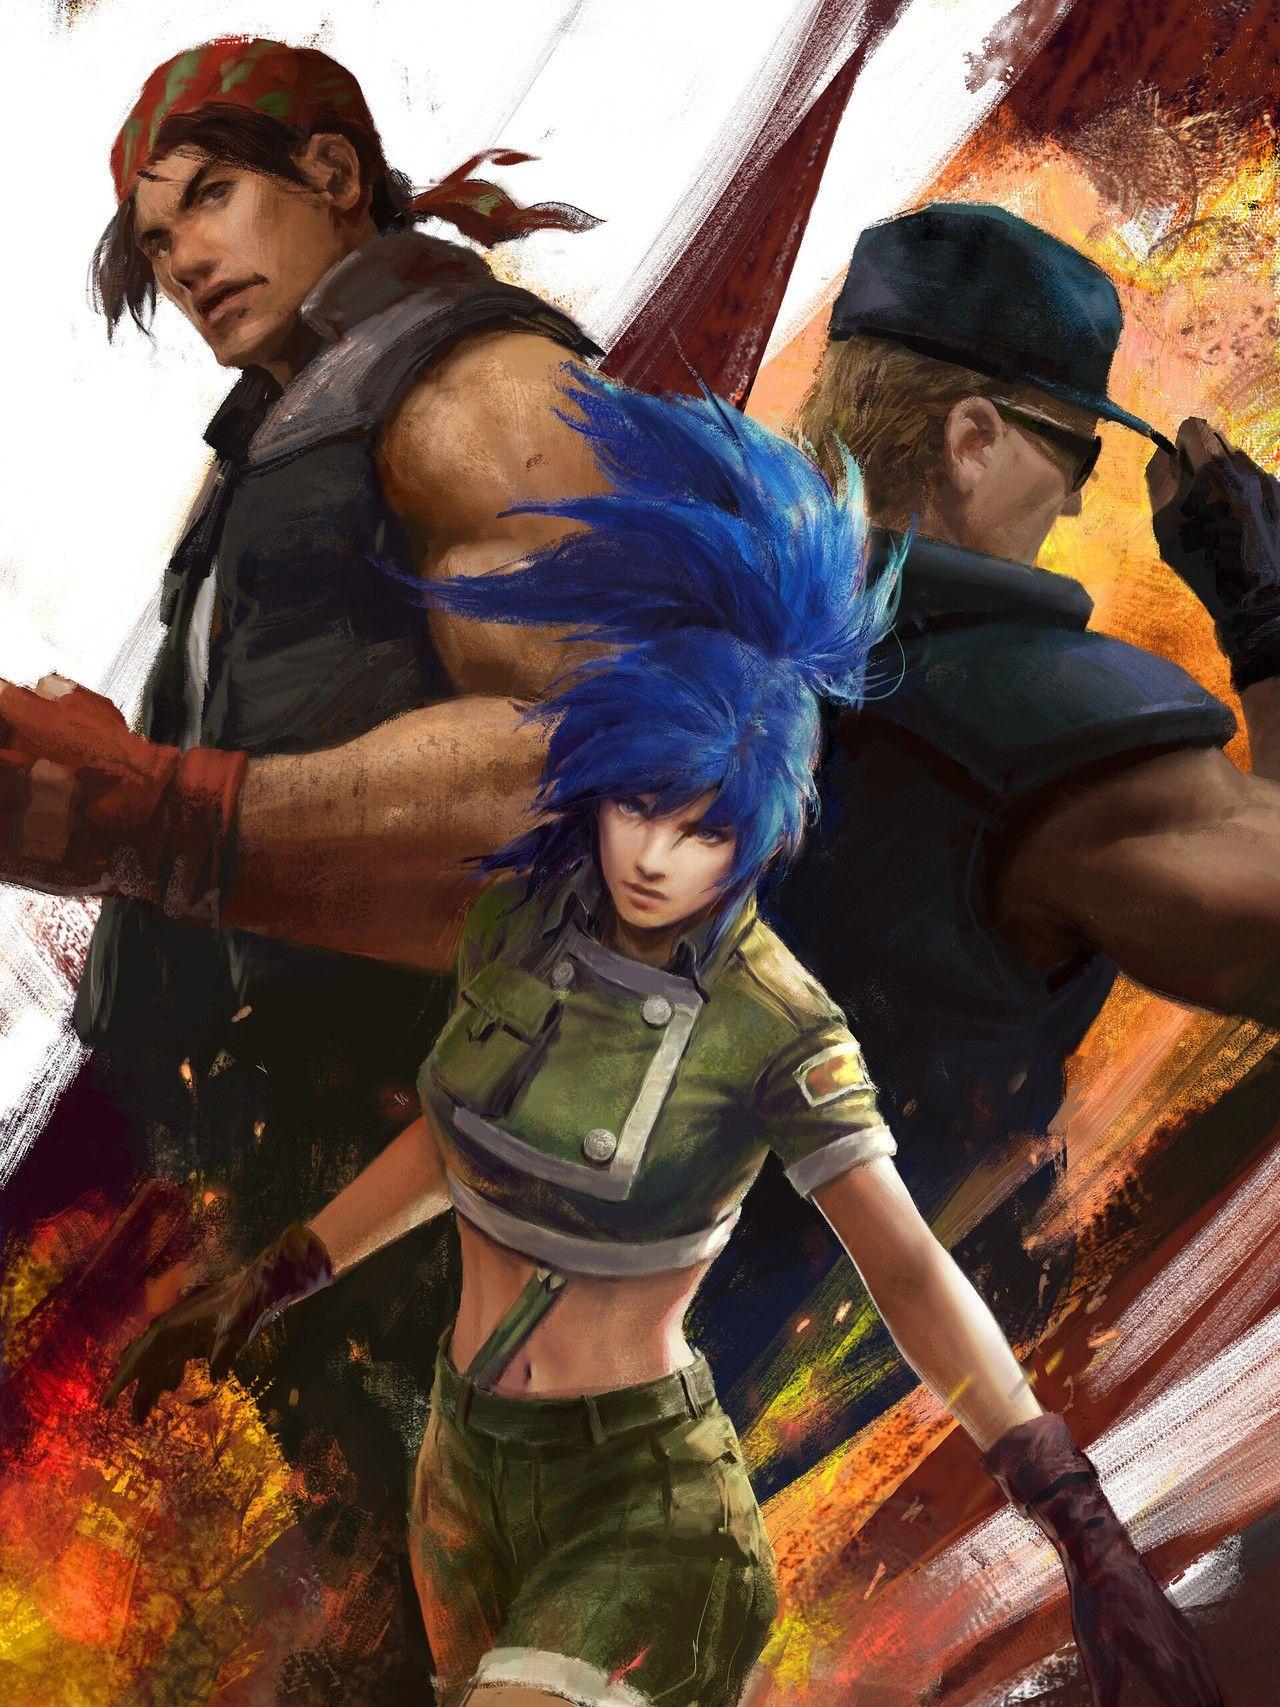 Pin De Siti Nurfadilah Em King Of Fighters King Of Fighters Lutador De Rua Personagens De Games